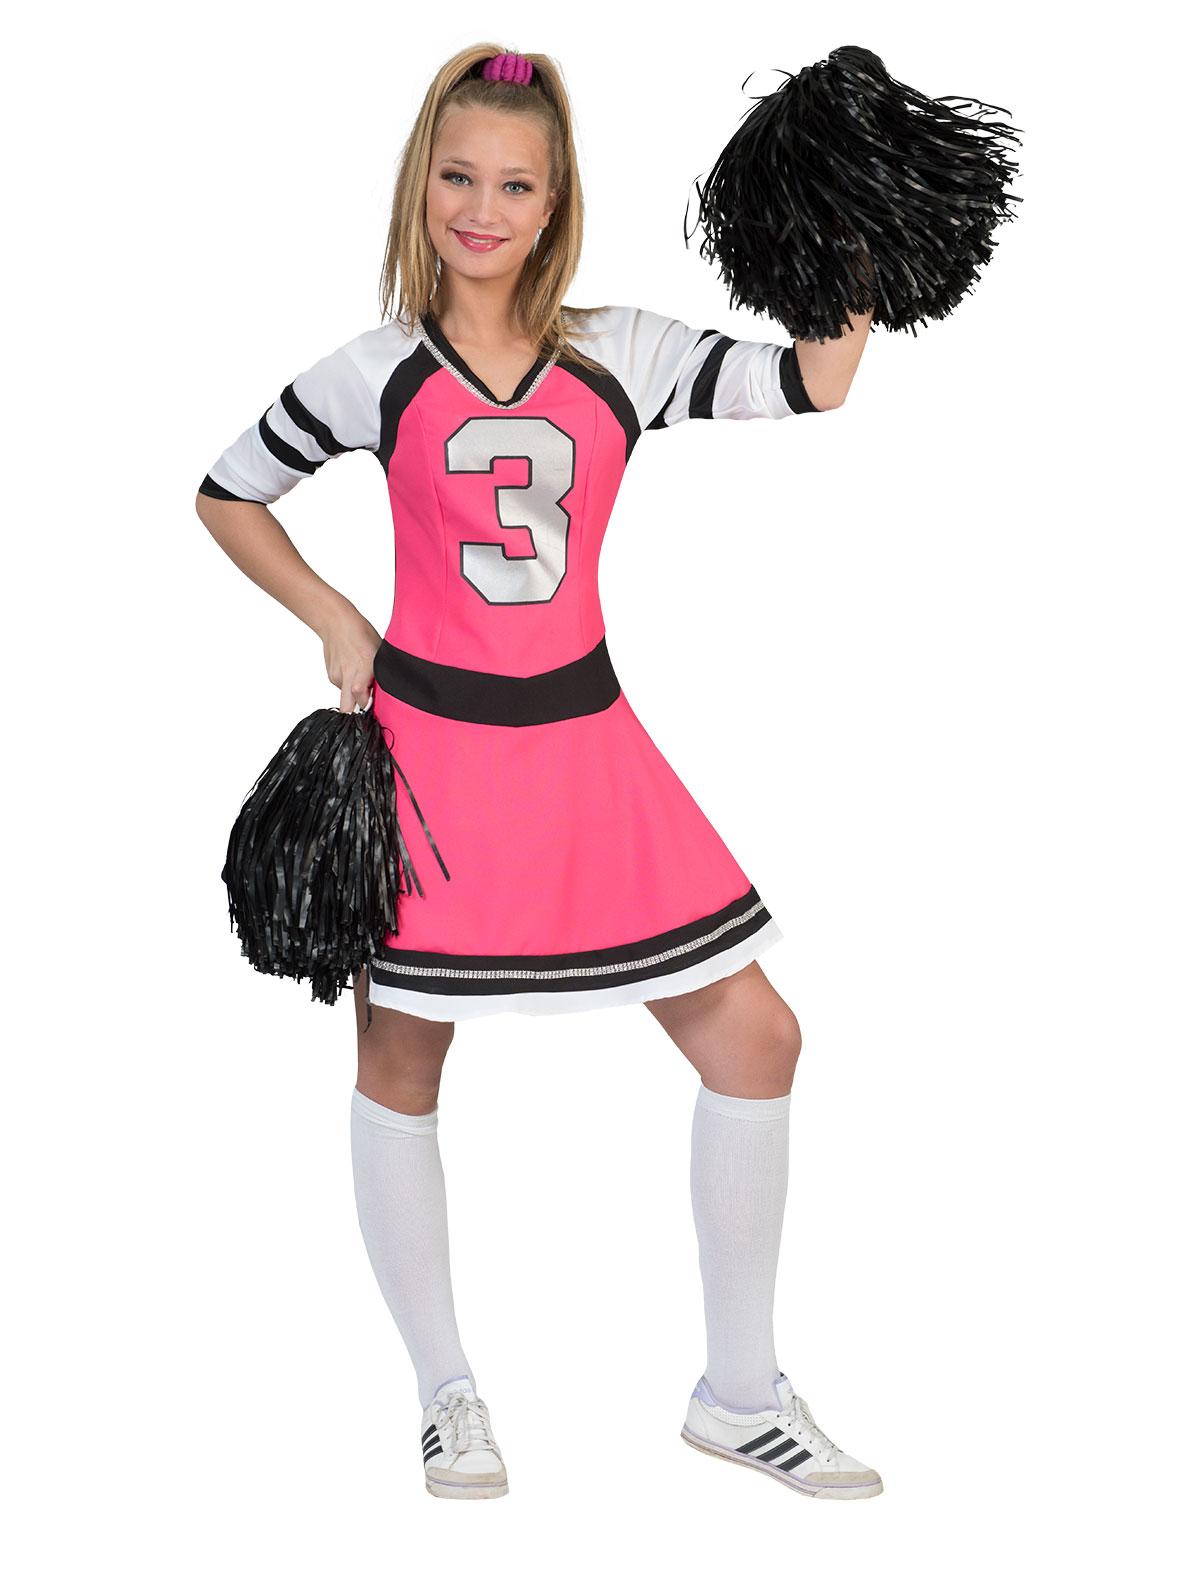 Cheerleader Harper